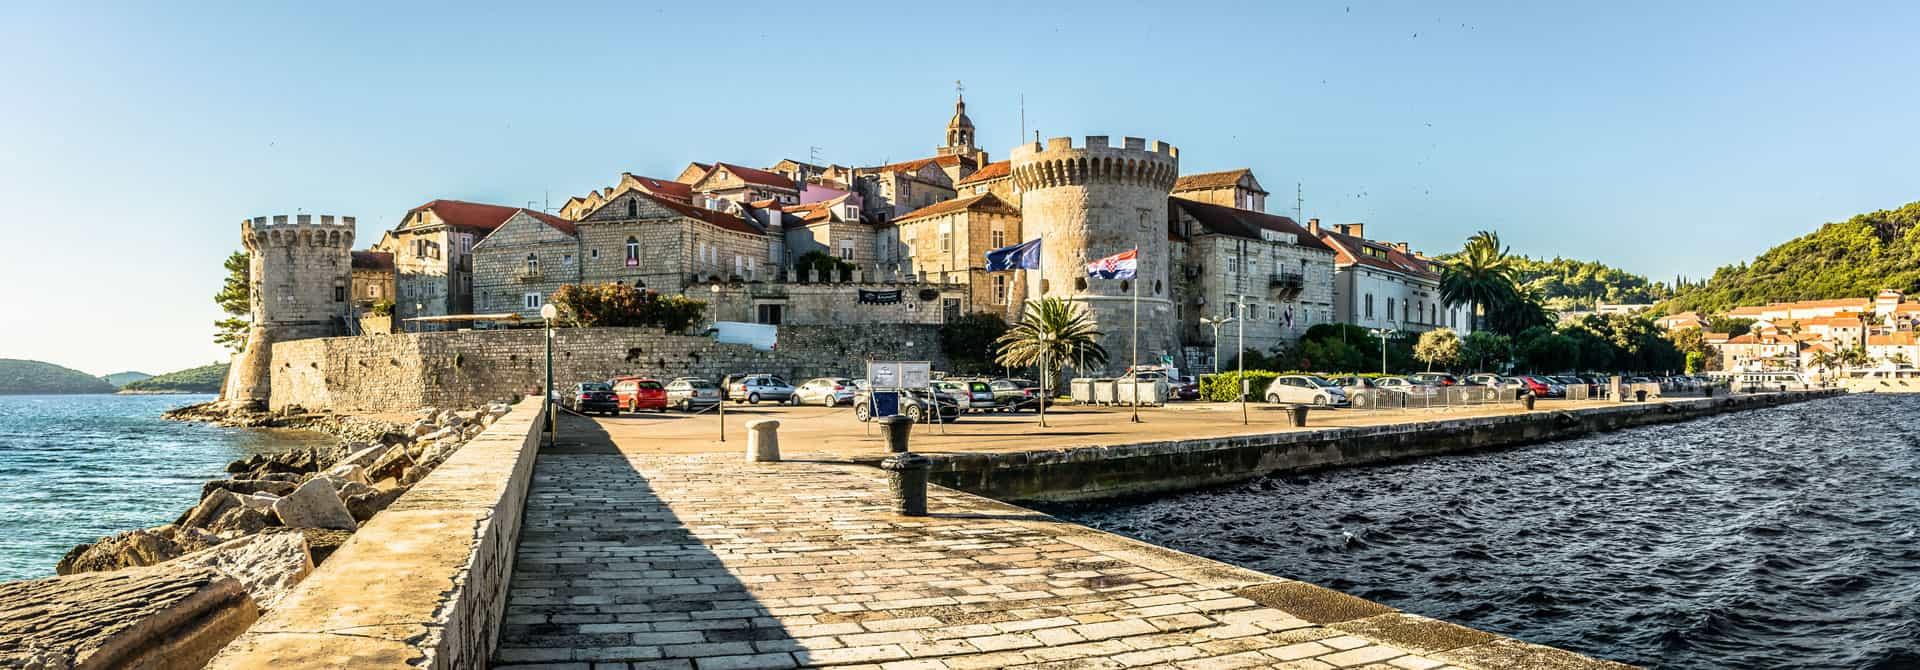 Stadt Korčula